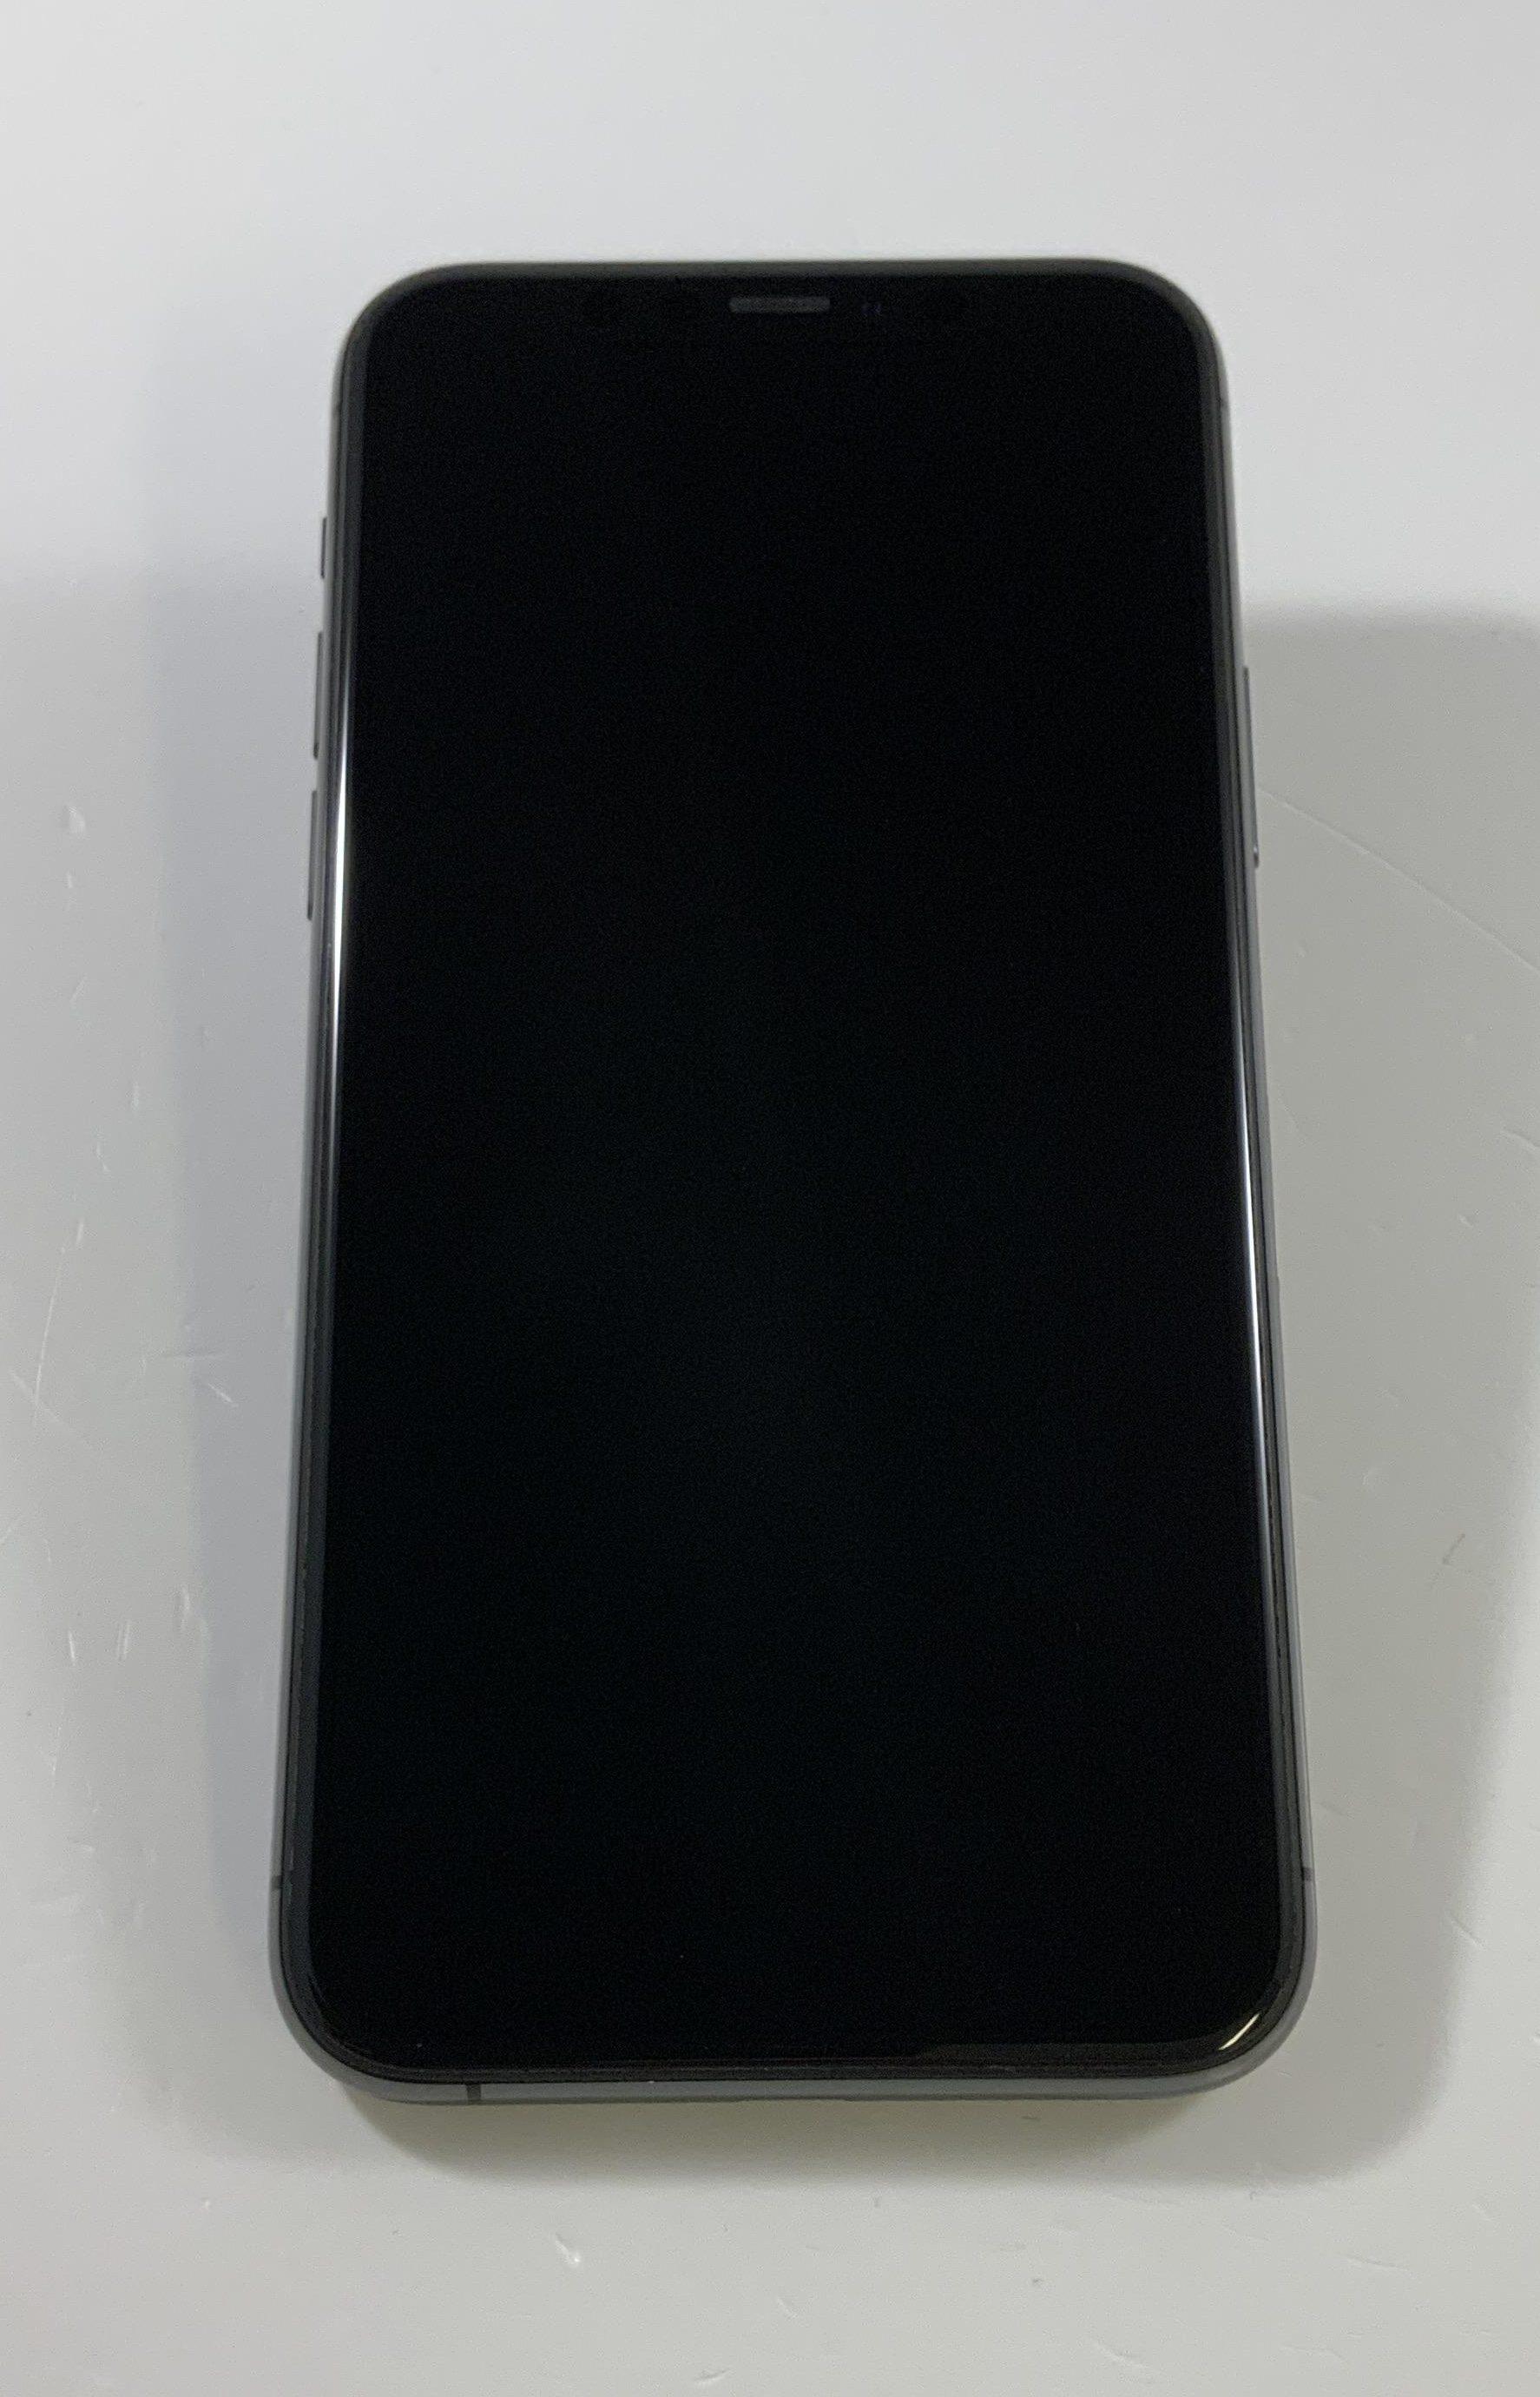 iPhone 11 Pro 512GB, 512GB, Space Gray, imagen 2